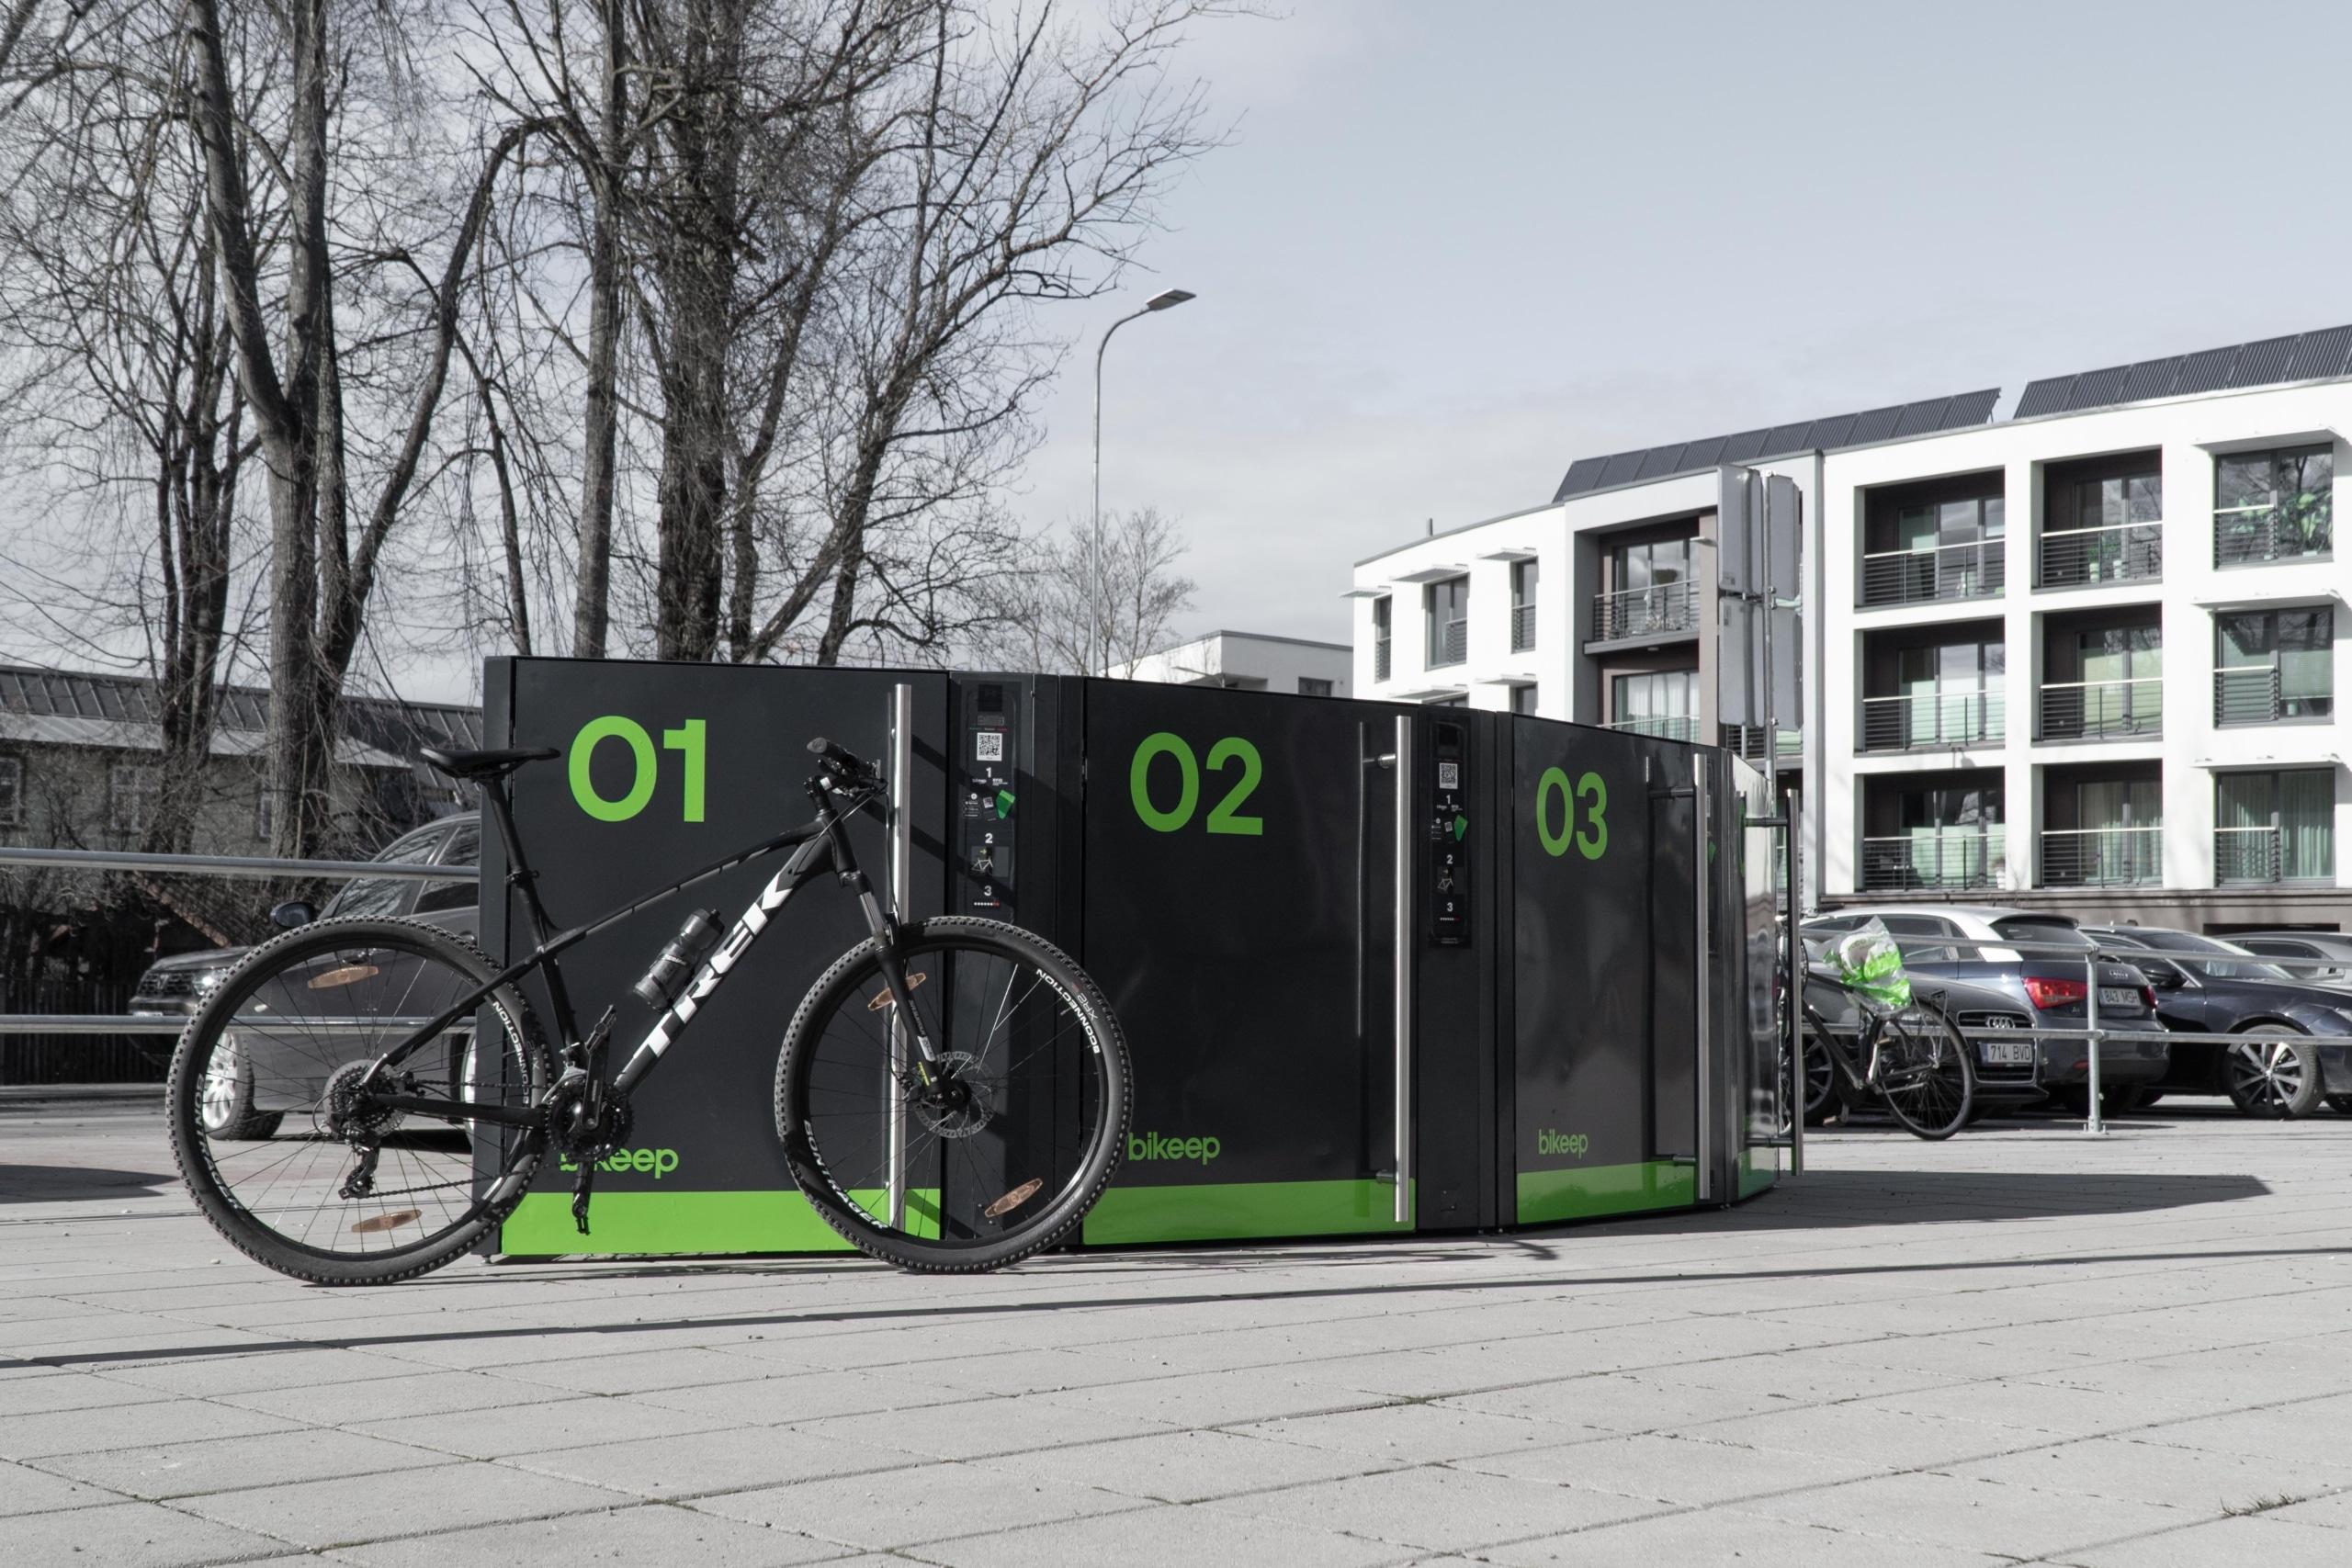 Bikeep lockers in transit stations enable municipalities plan urban commute more efficiently